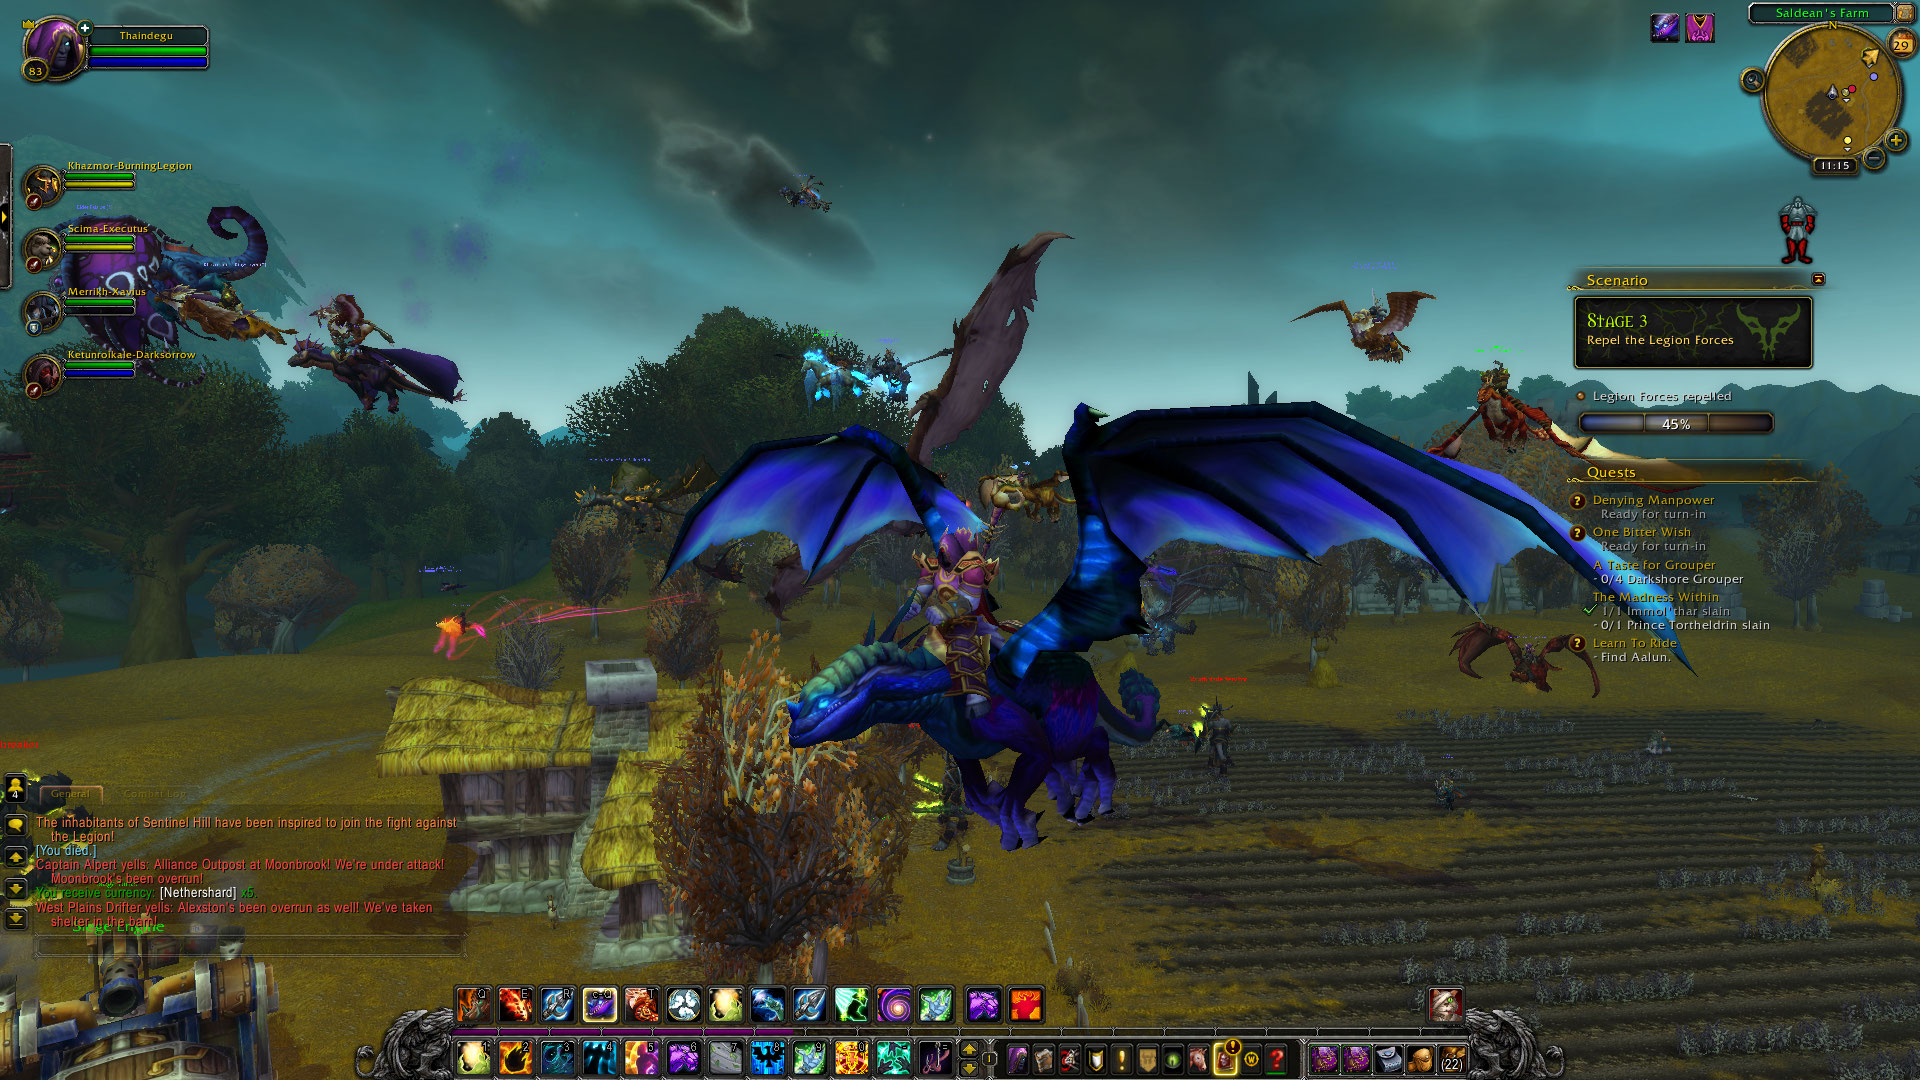 World of Warcraft: Legion fotoseriál - Plamenná legie přichází 129822